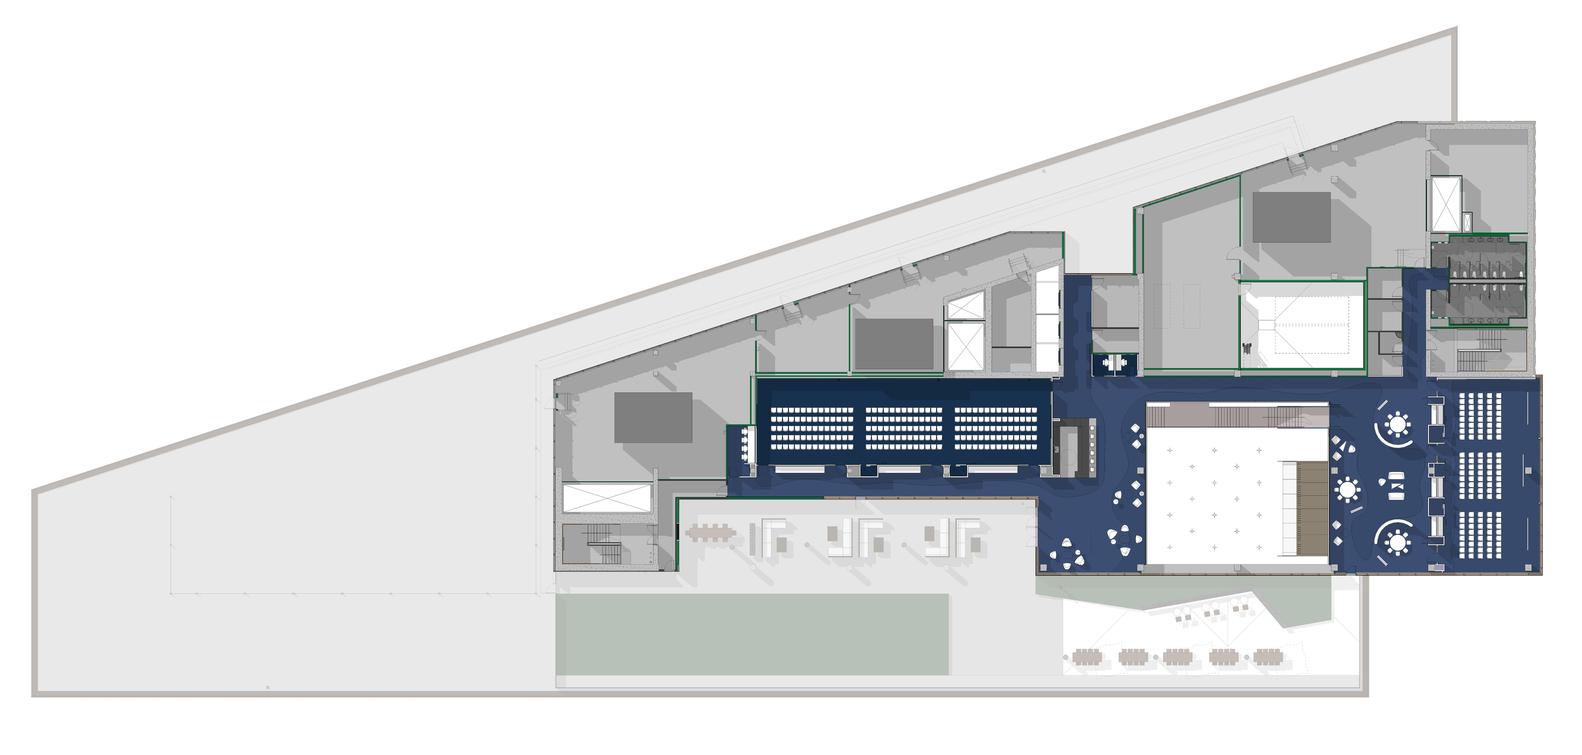 Intuit海洋路大廈——探索可持續的公共參與型發展模式插图21